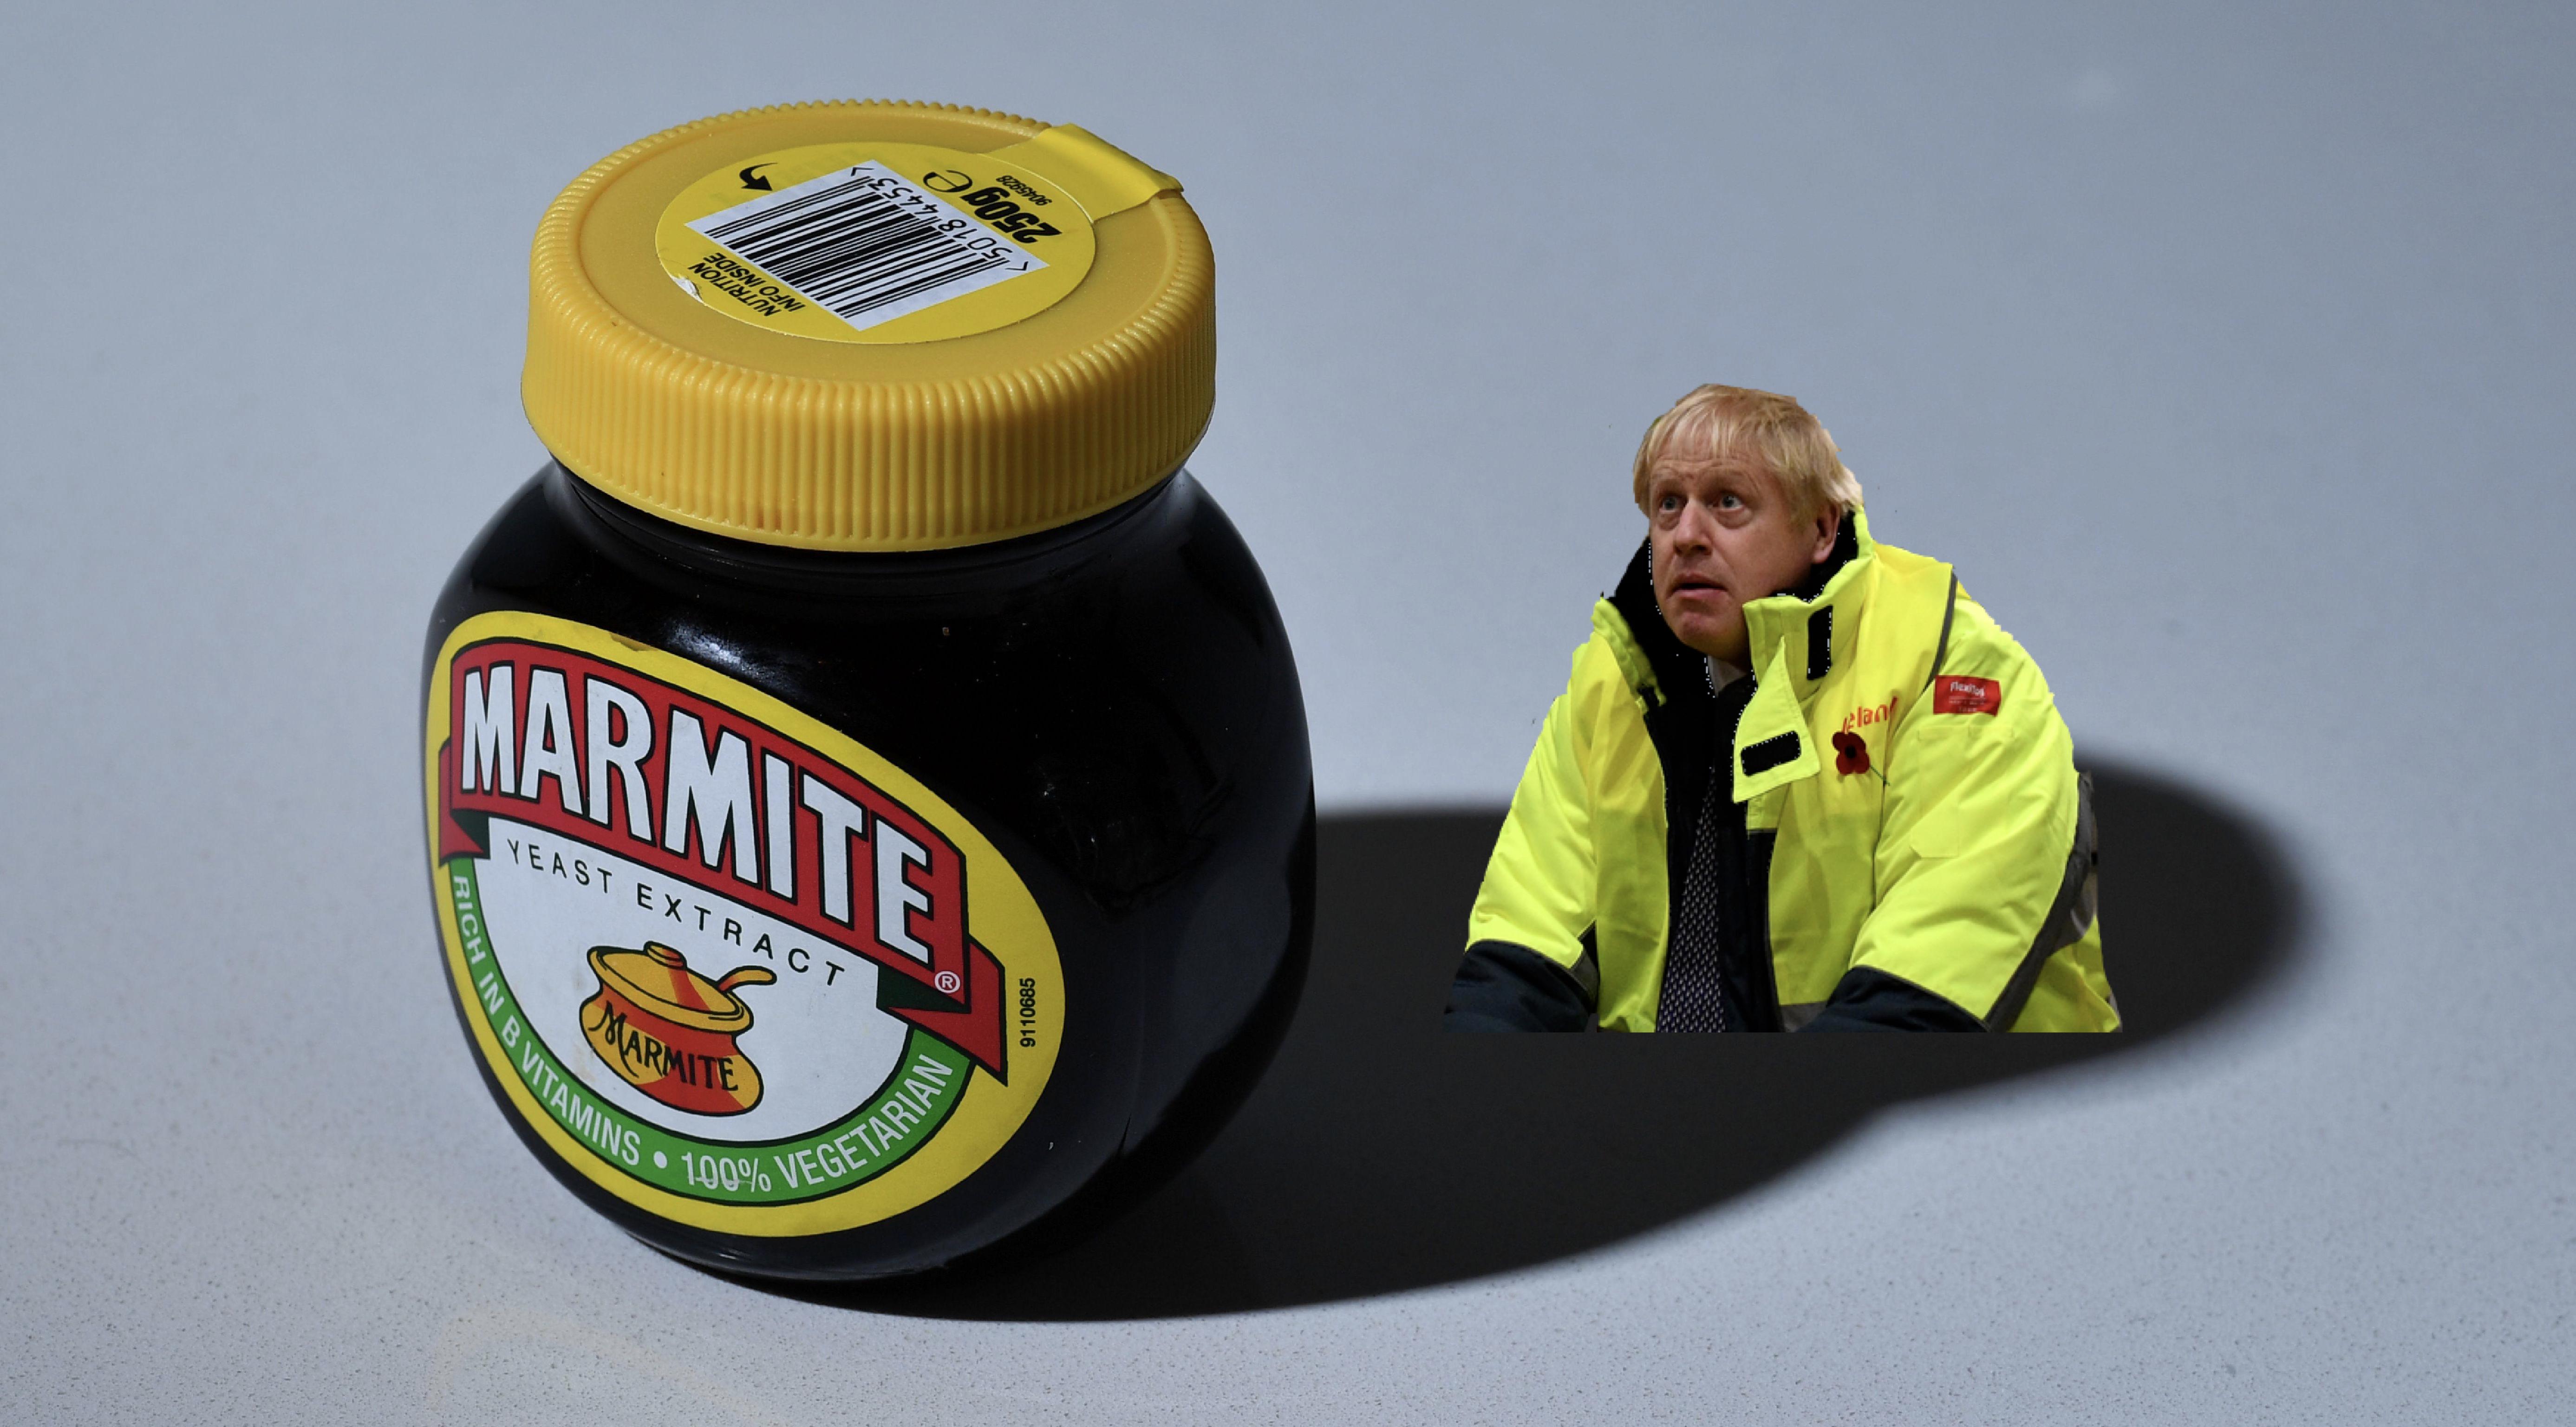 Boris Johnson stares at a jar of Marmite